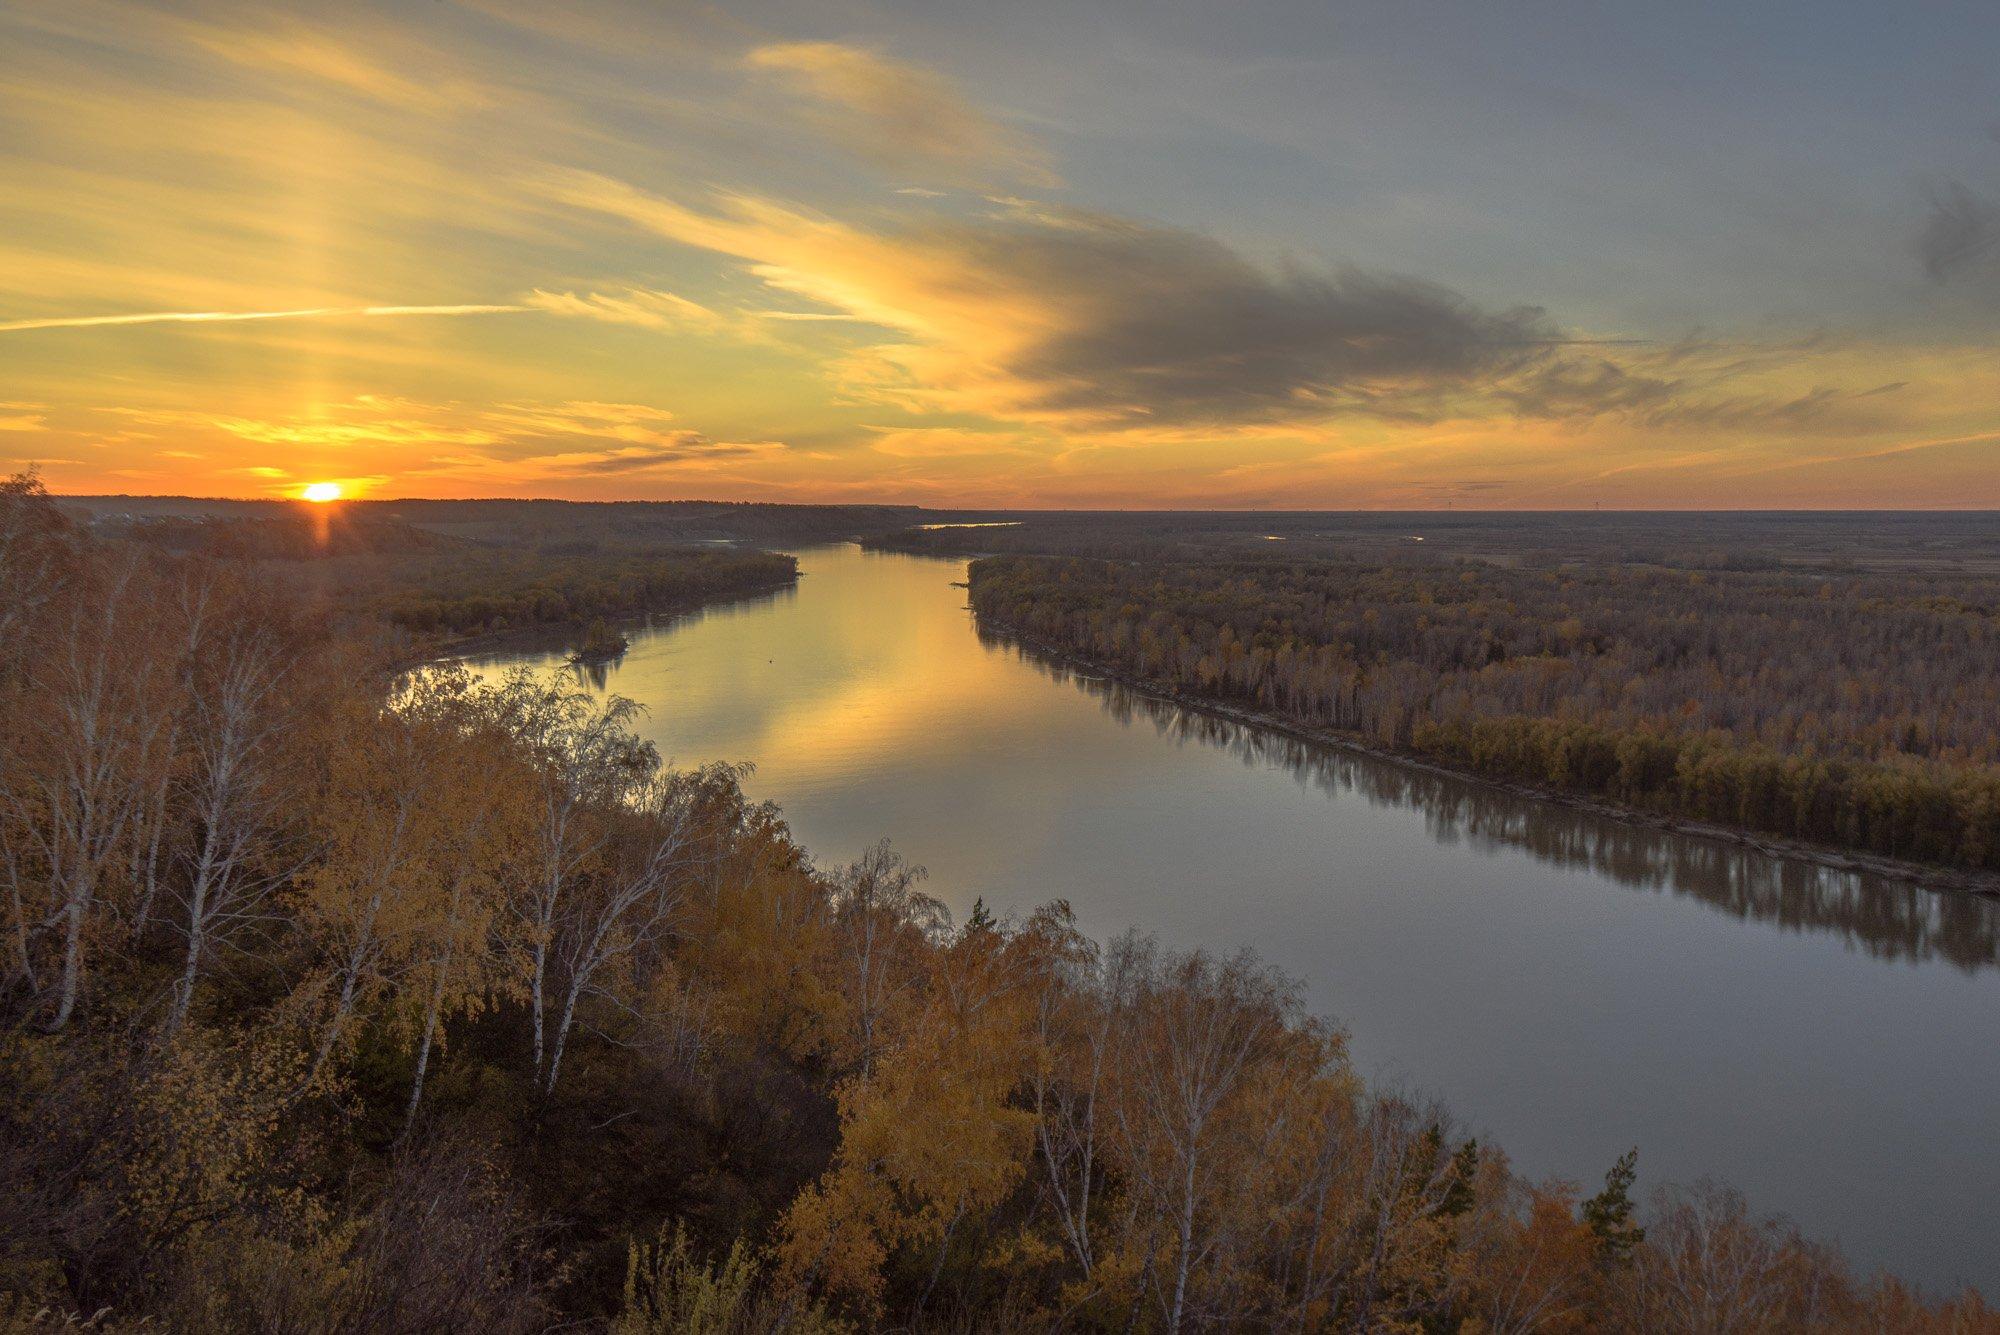 осень, облака, вечер, закат, пейзаж, природа, река, небо, Дмитрий Старостенков